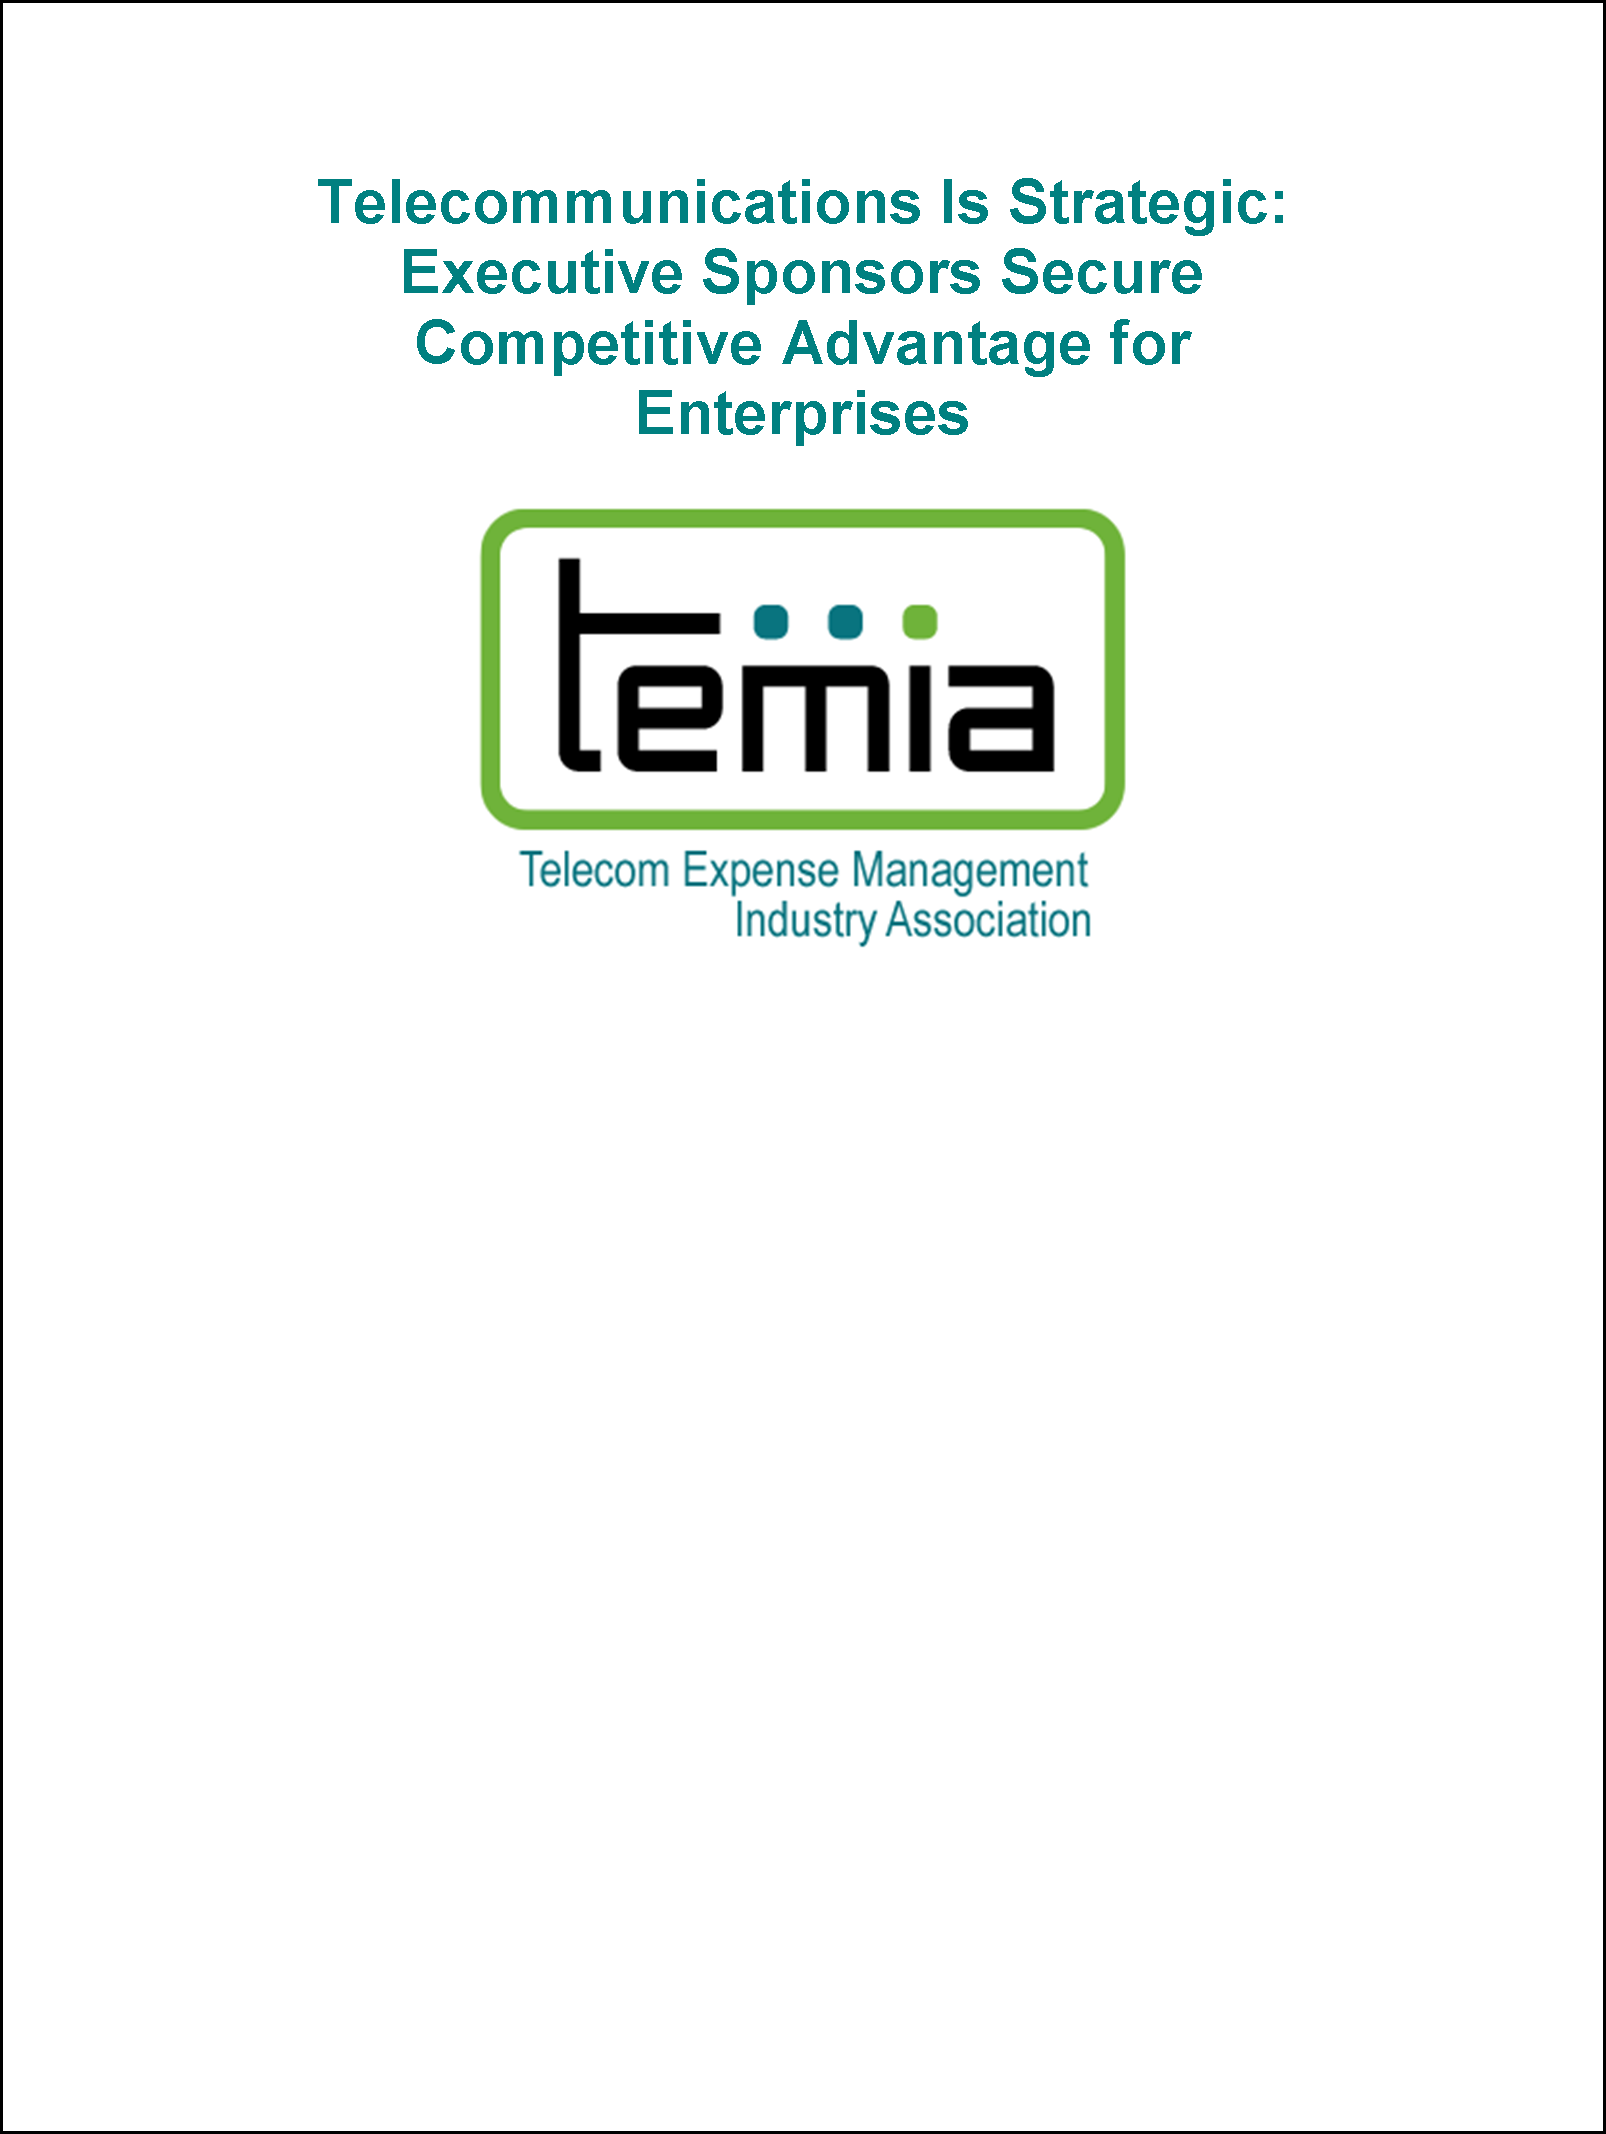 MTS_TEMSuite_TEMIA_Telecommunications_Is_Strategic_WhitePaper